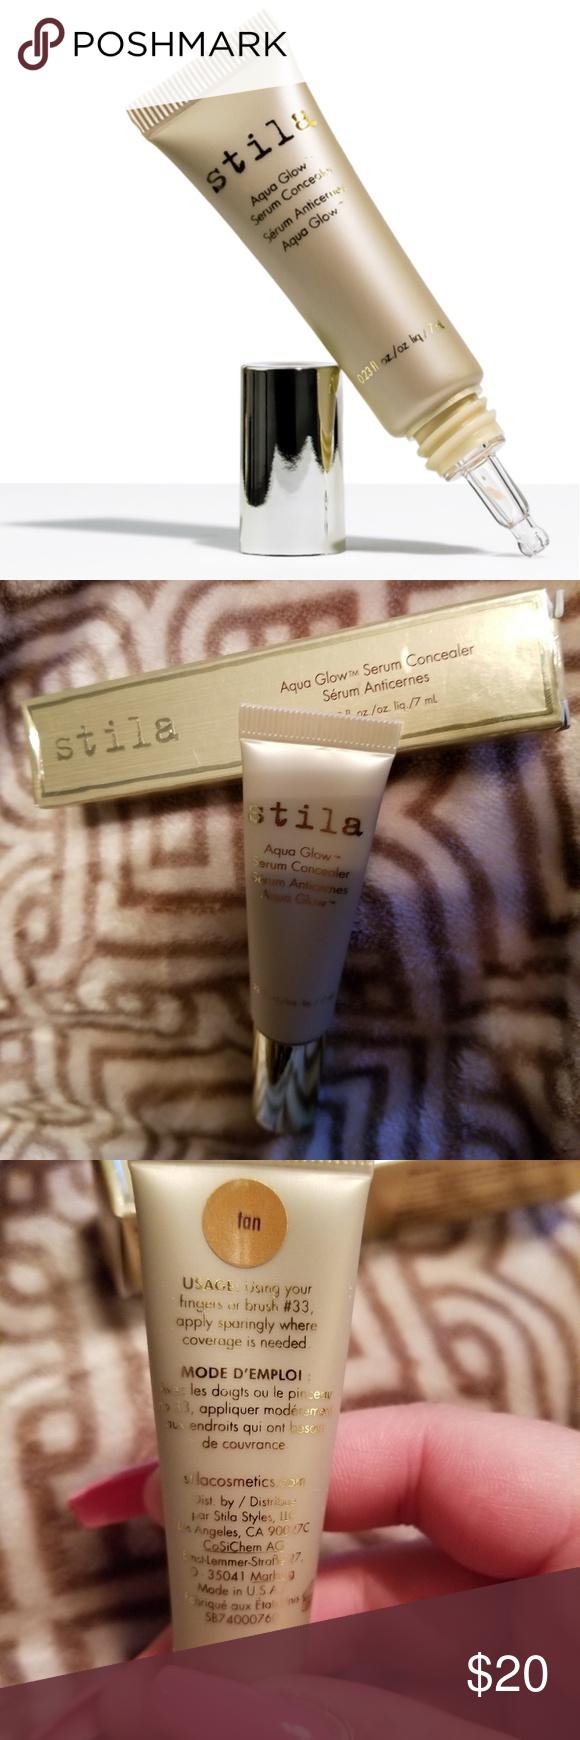 Stila Aqua Glow serum concealer Tan NWT Concealer for